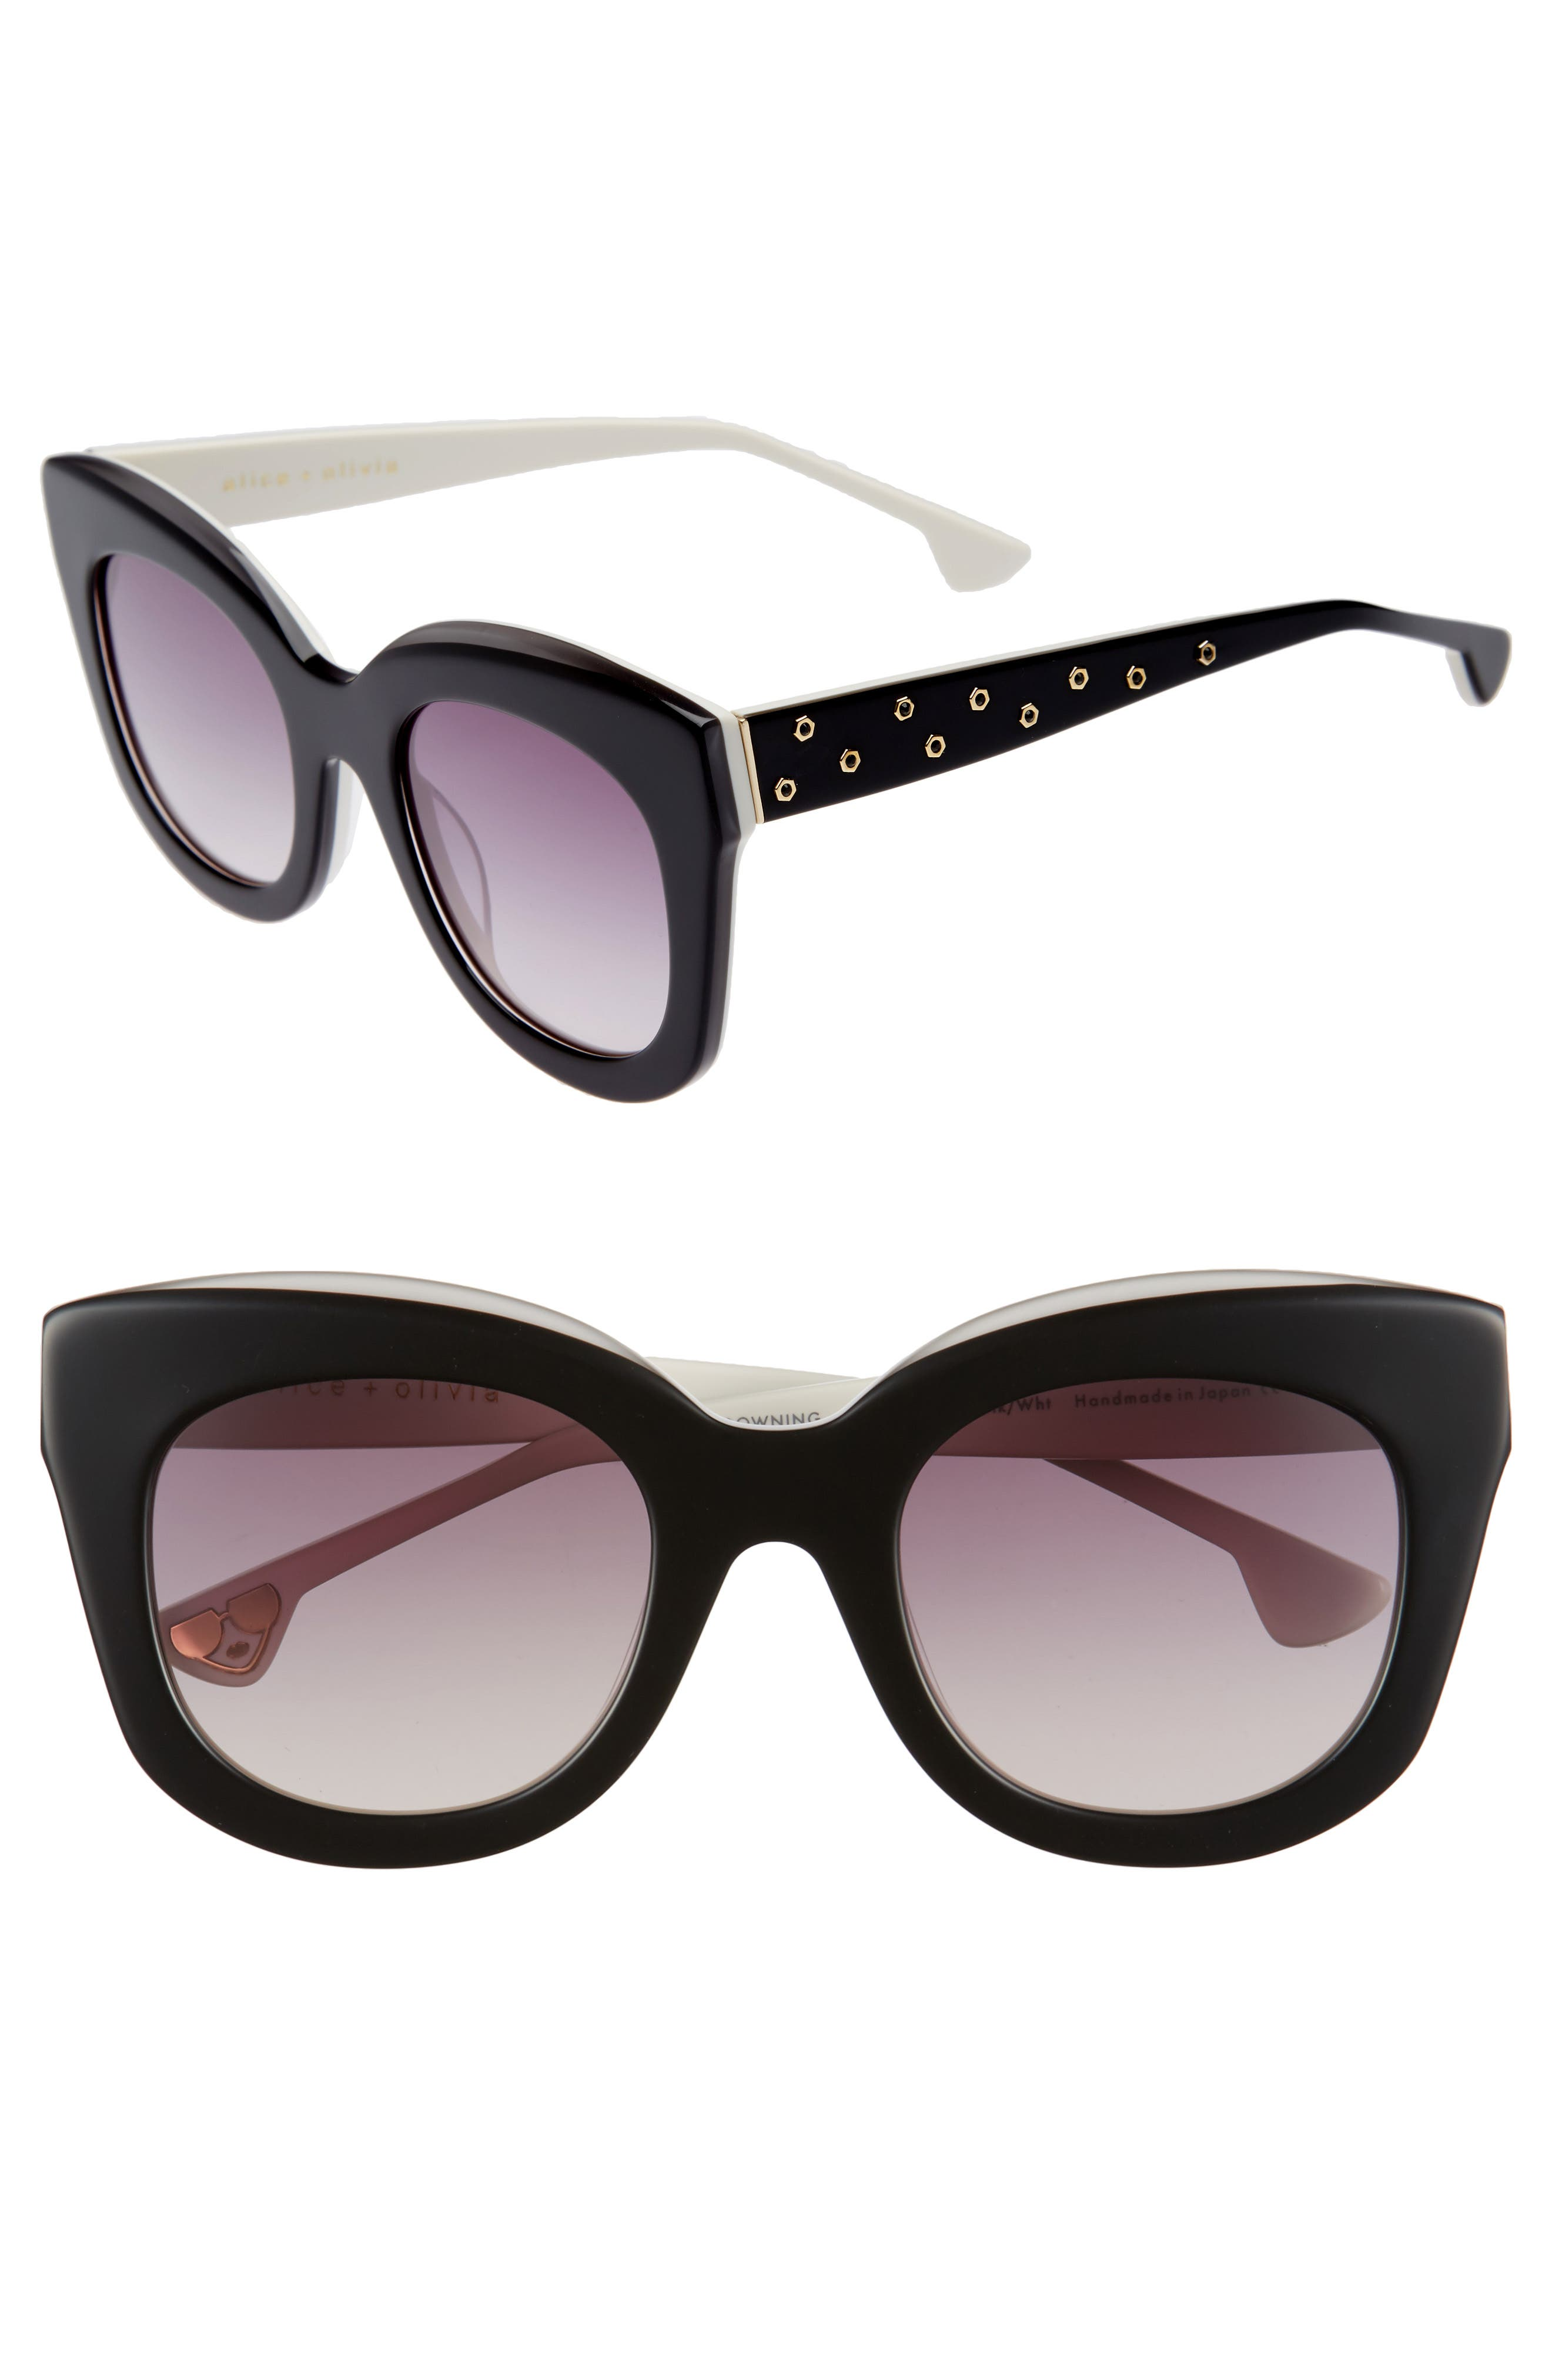 Downing 51mm Cat Eye Sunglasses,                         Main,                         color, Black/ White